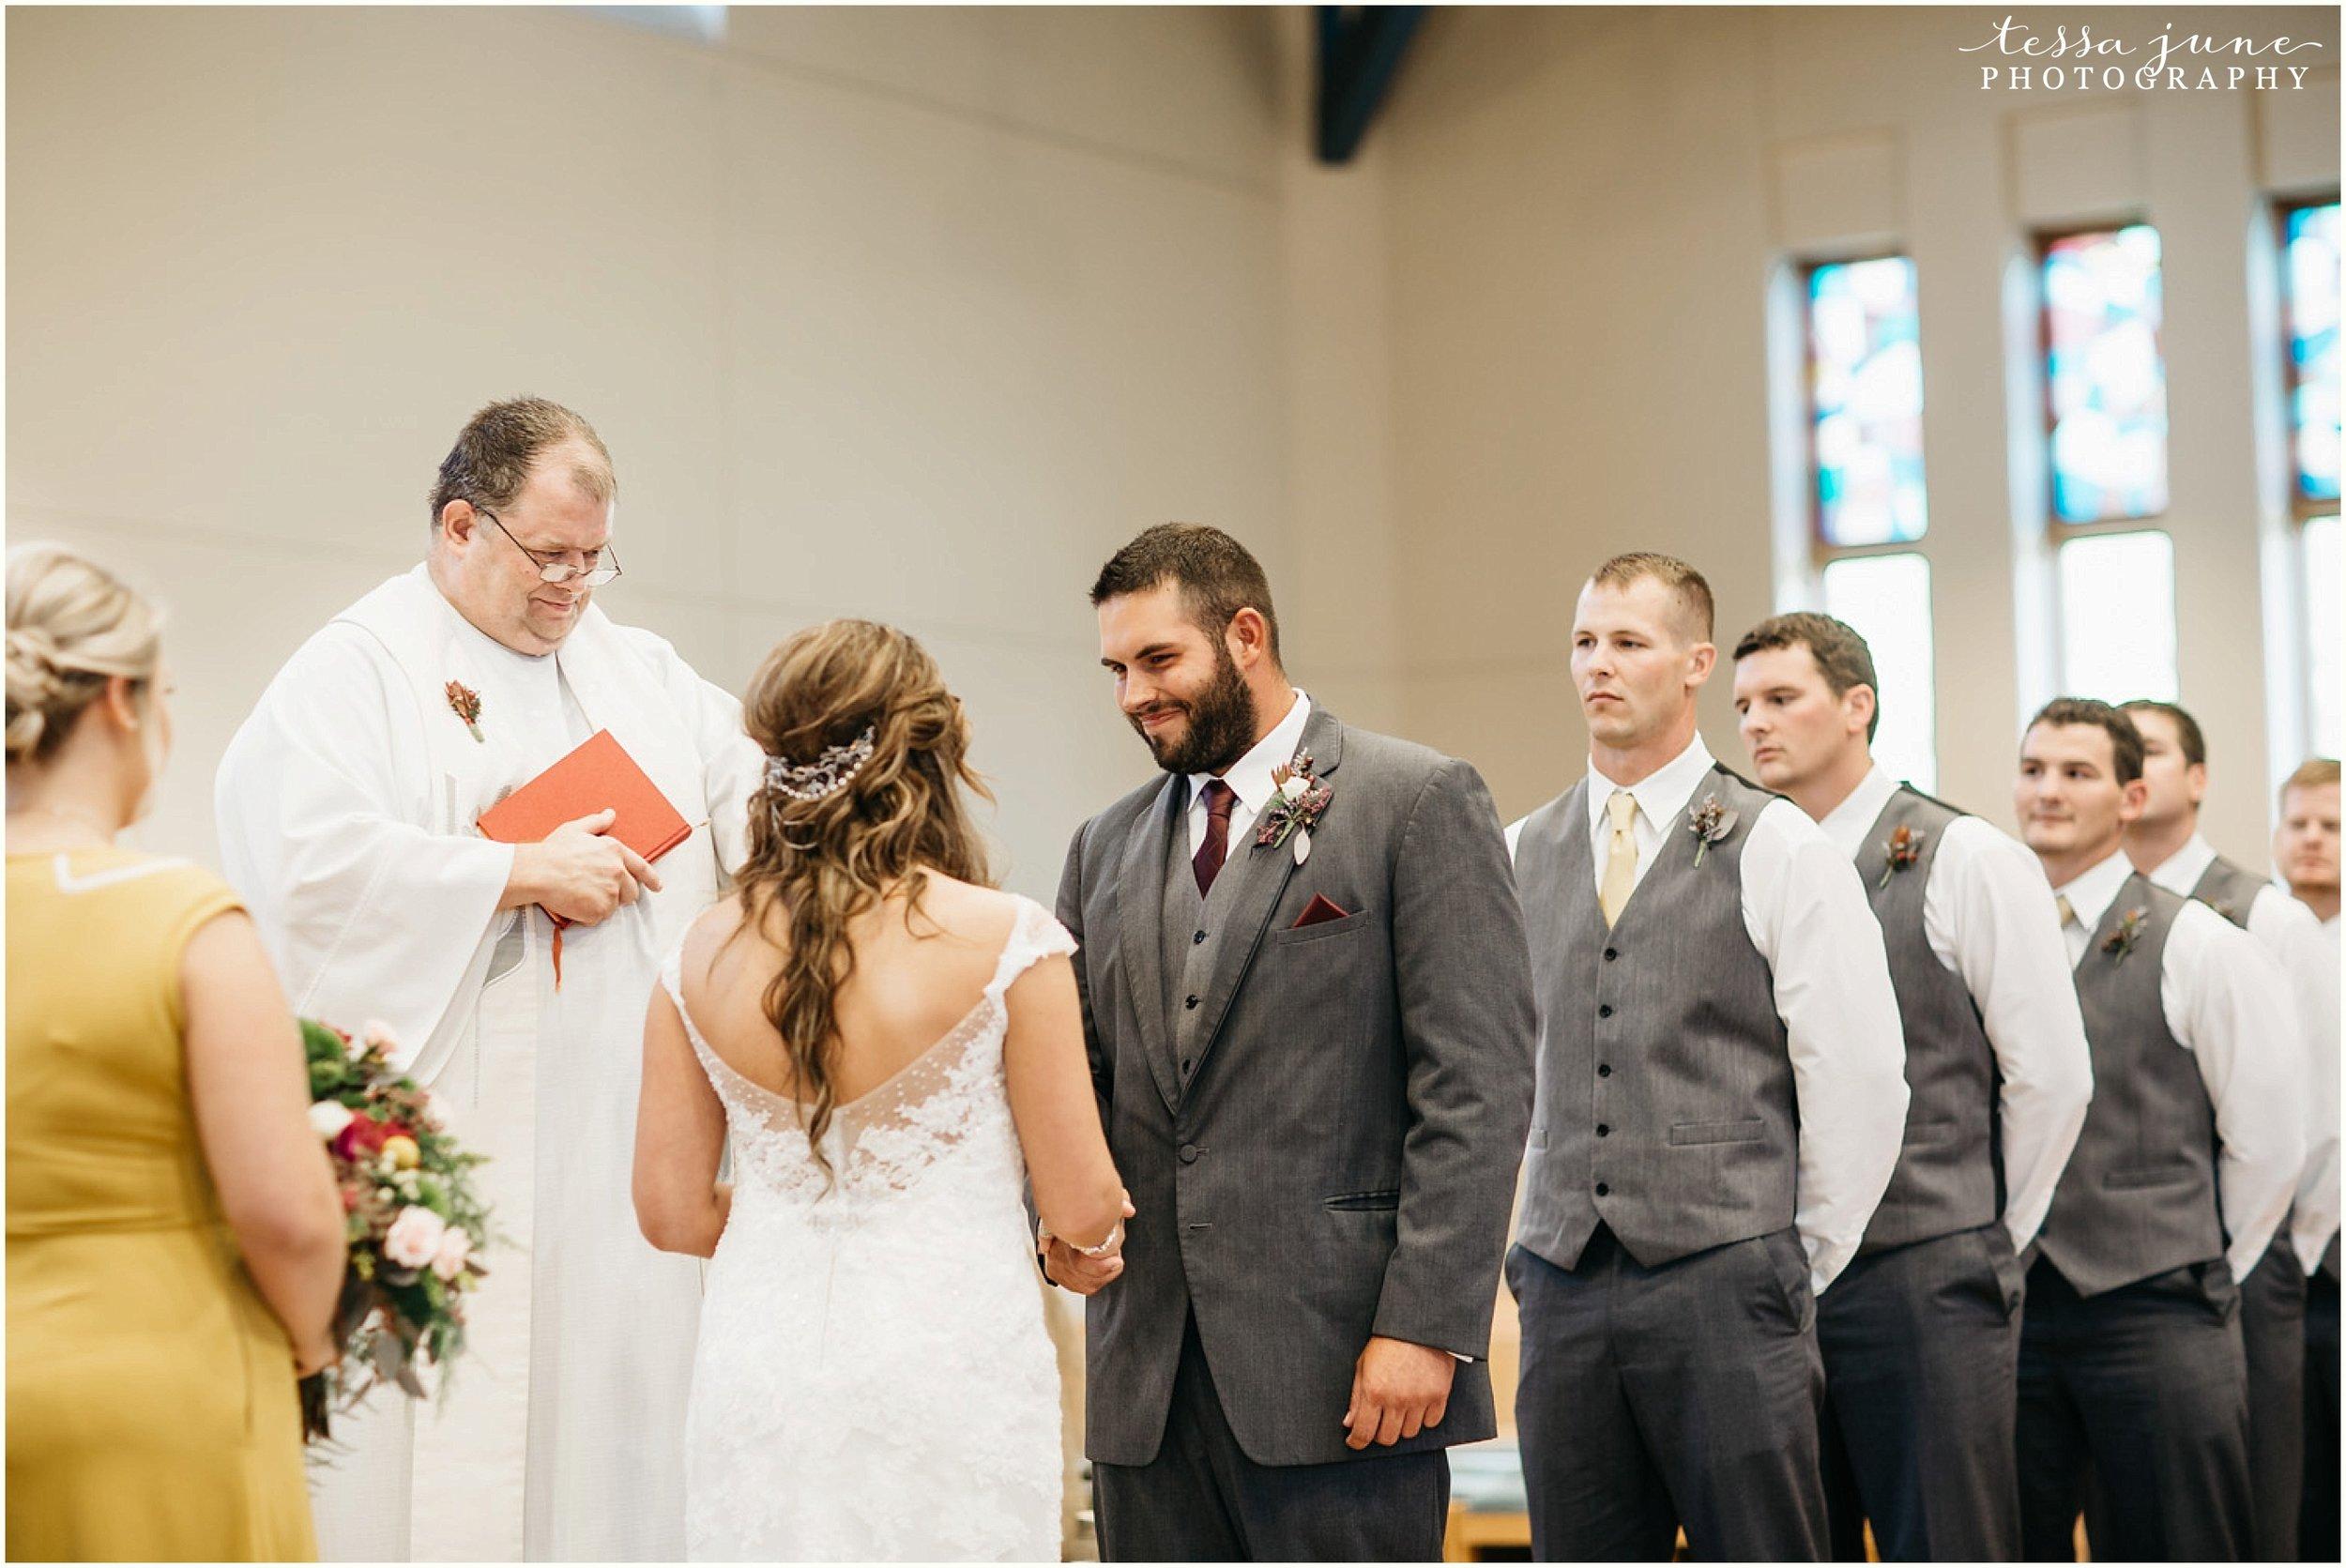 bohemian-minnesota-wedding-mismatched-bridesmaid-dresses-waterfall-st-cloud-tessa-june-photography-112.jpg